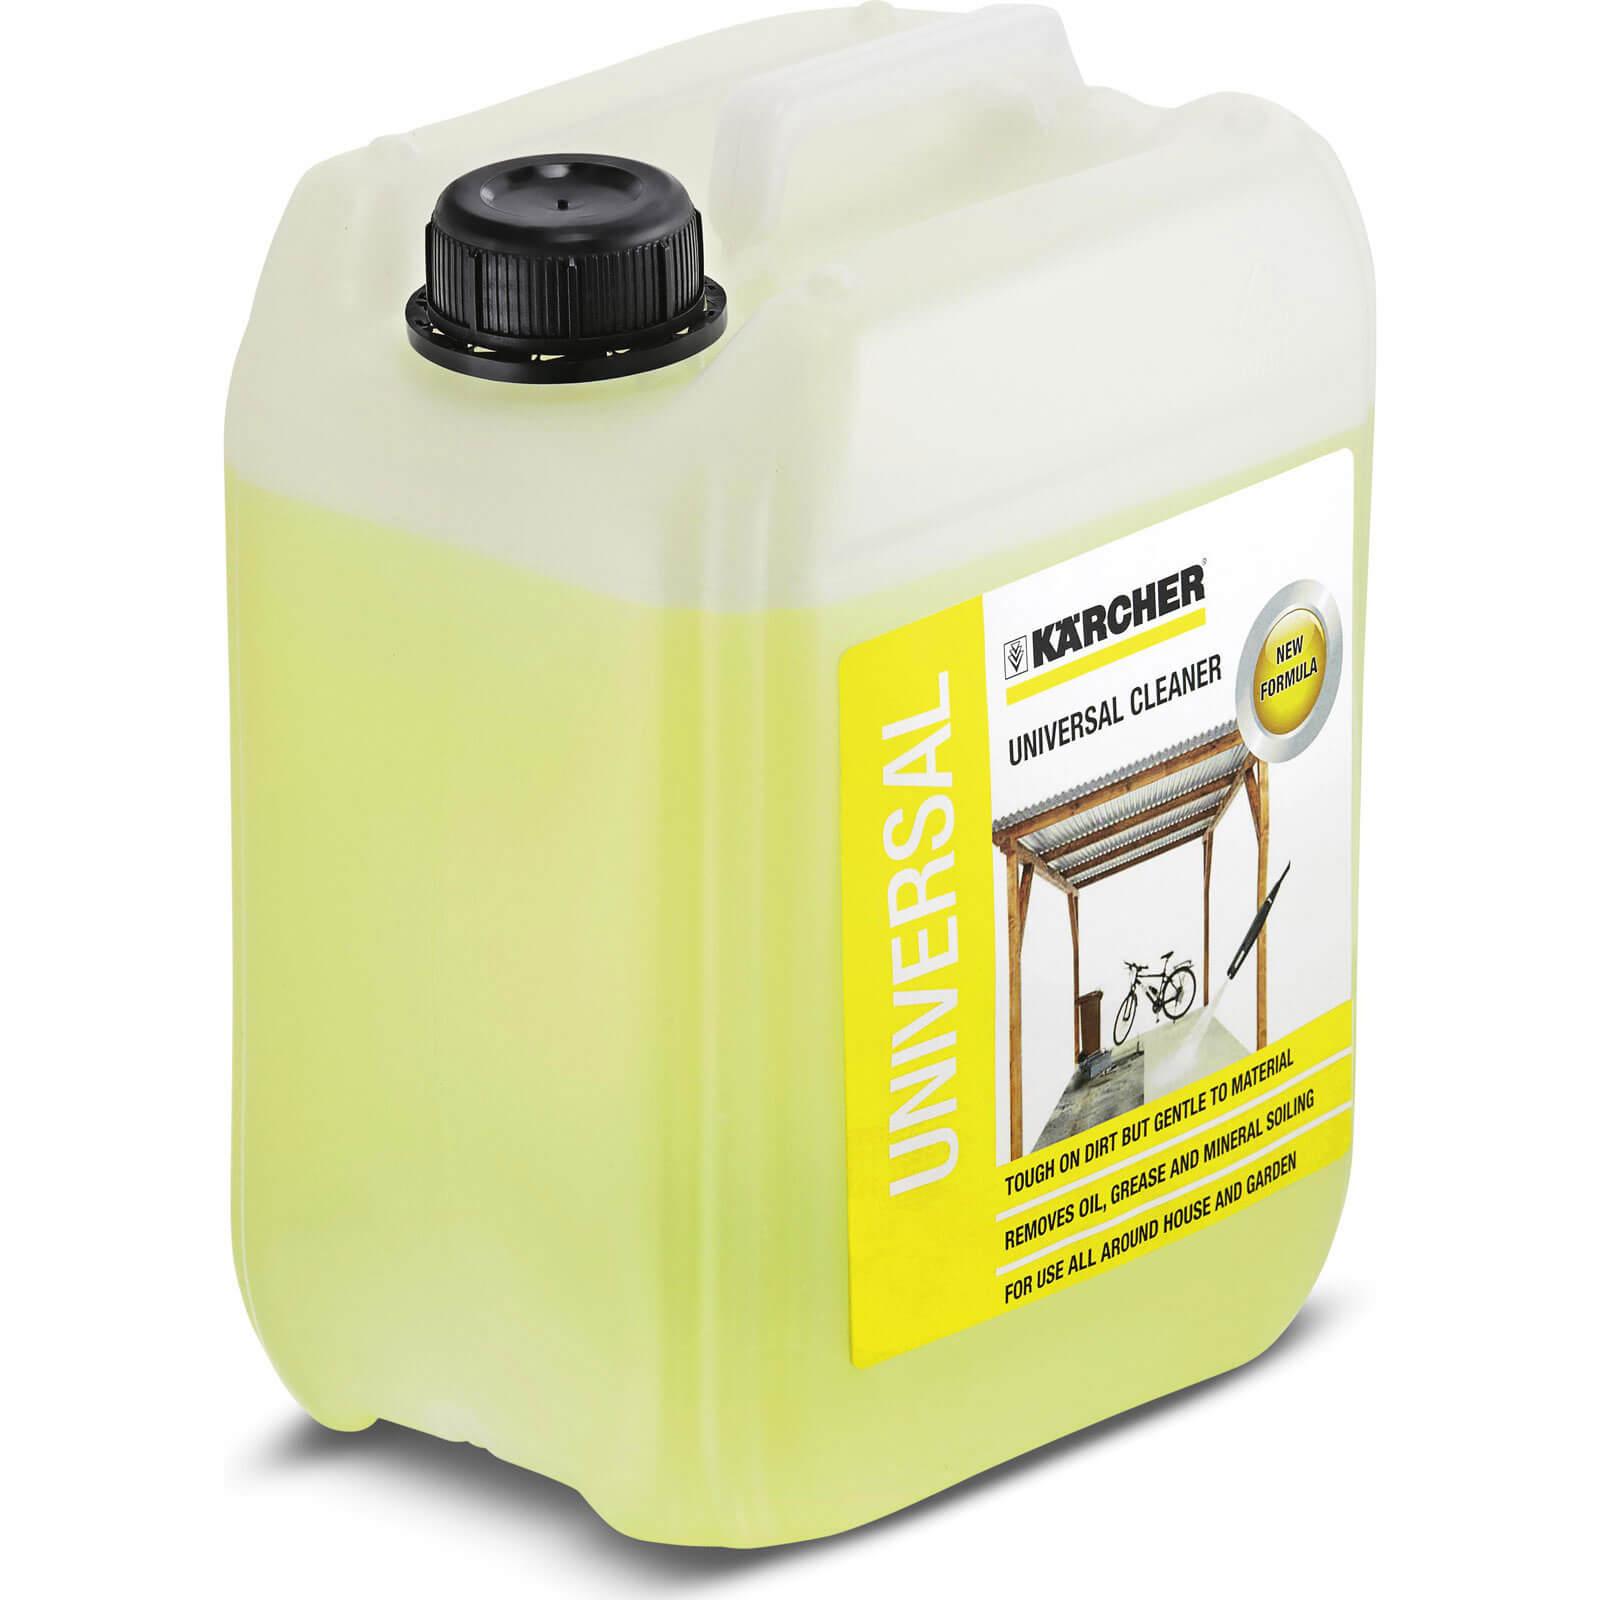 Karcher RM 555 Universal Cleaner Detergent 5 Litres